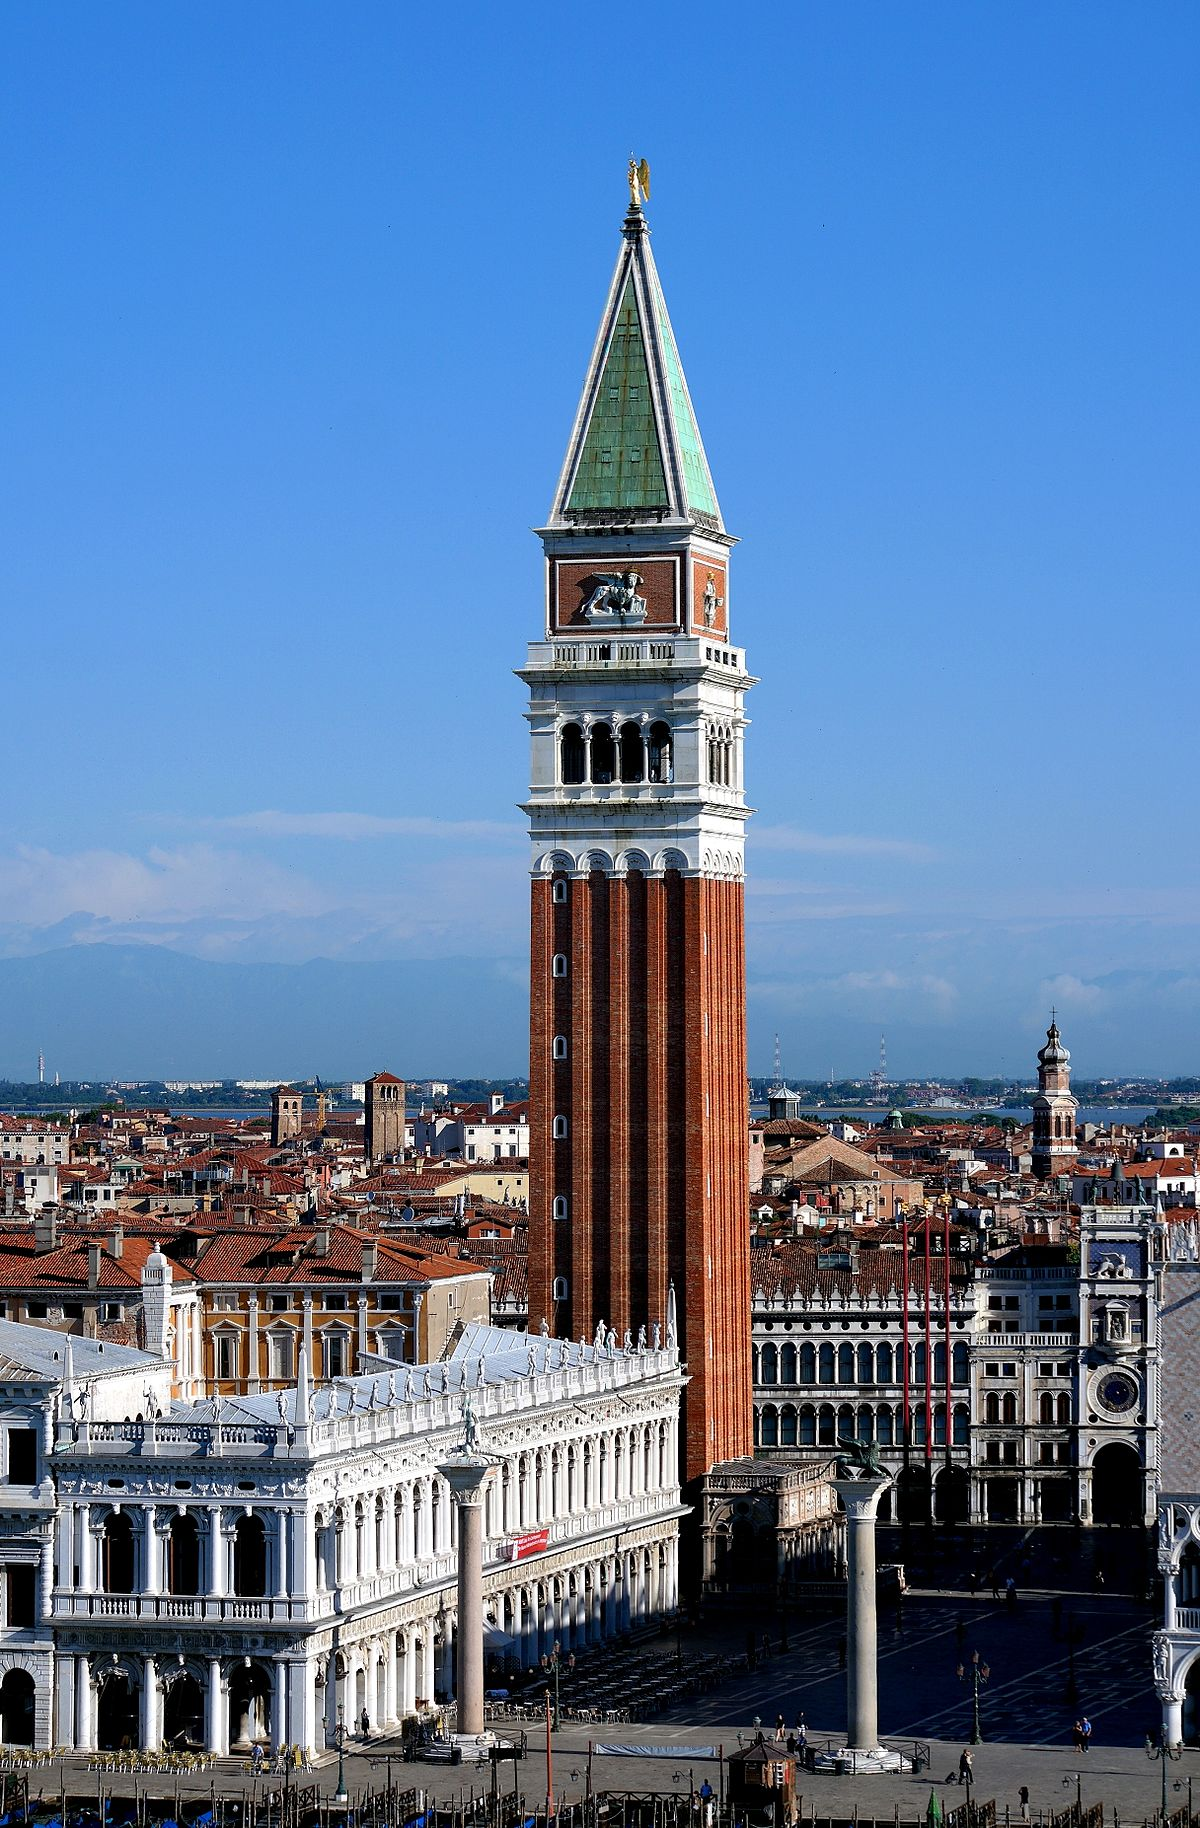 campanile piazza san marco venezia